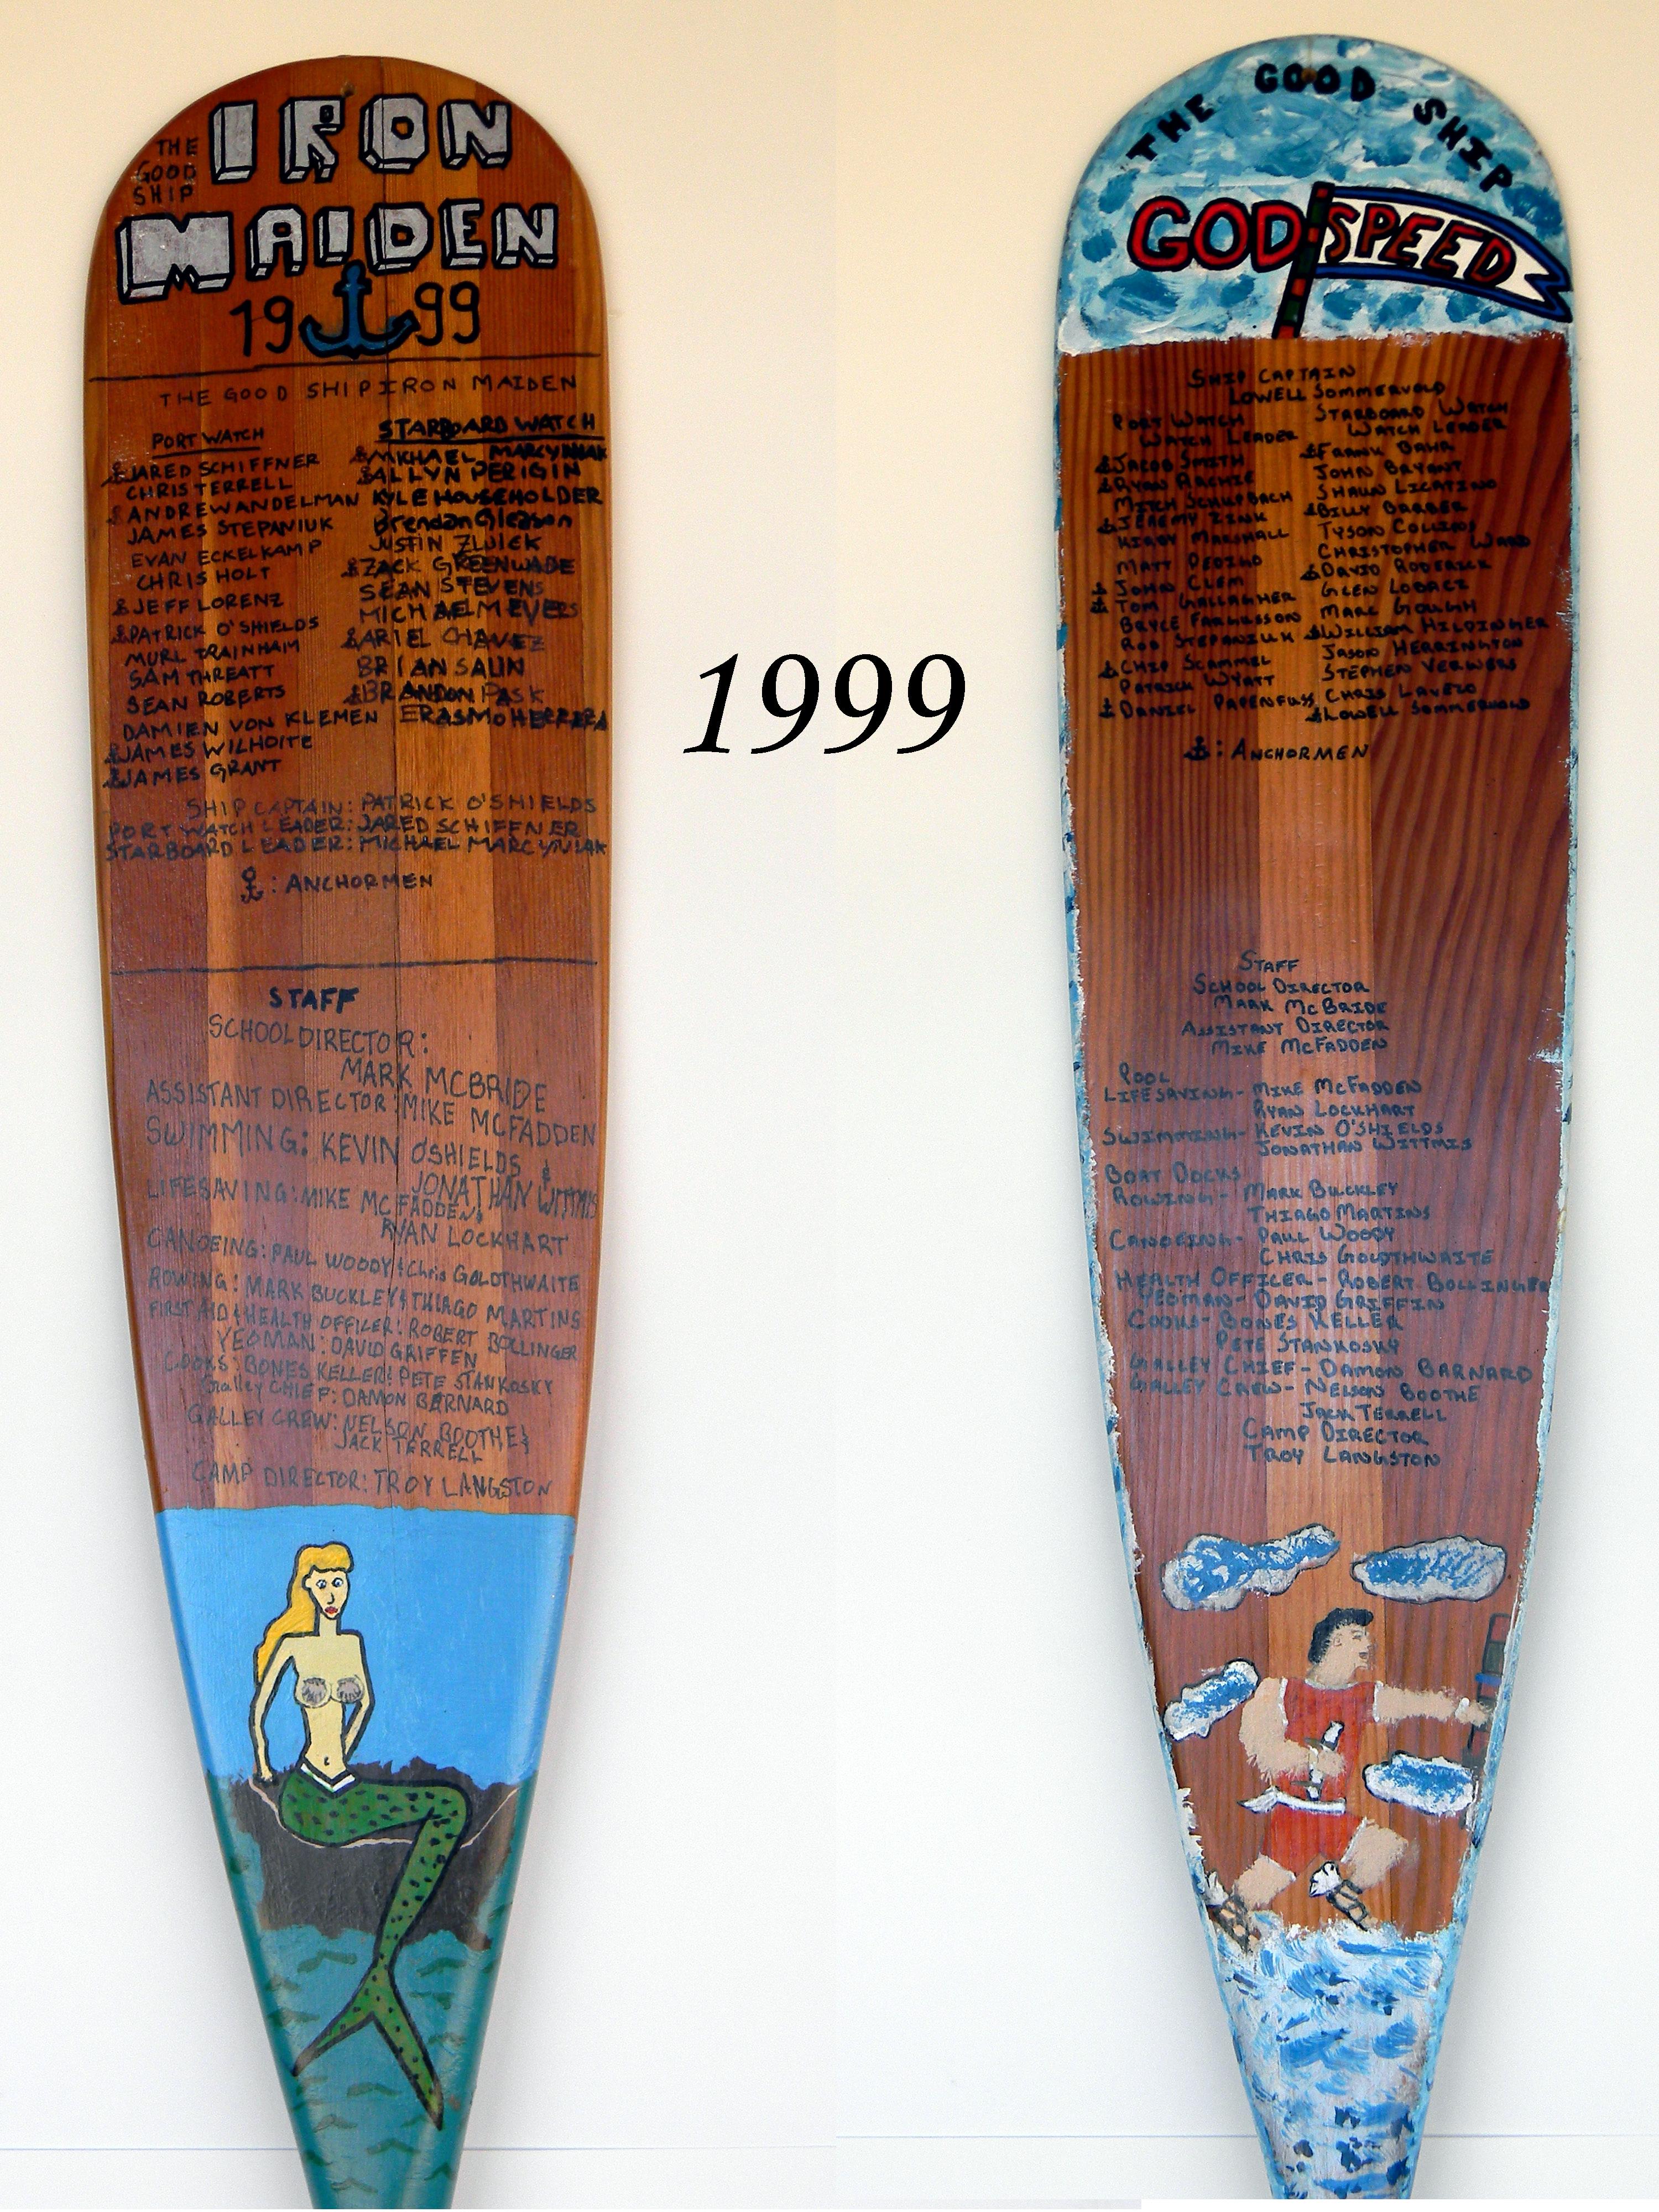 1999.jpg